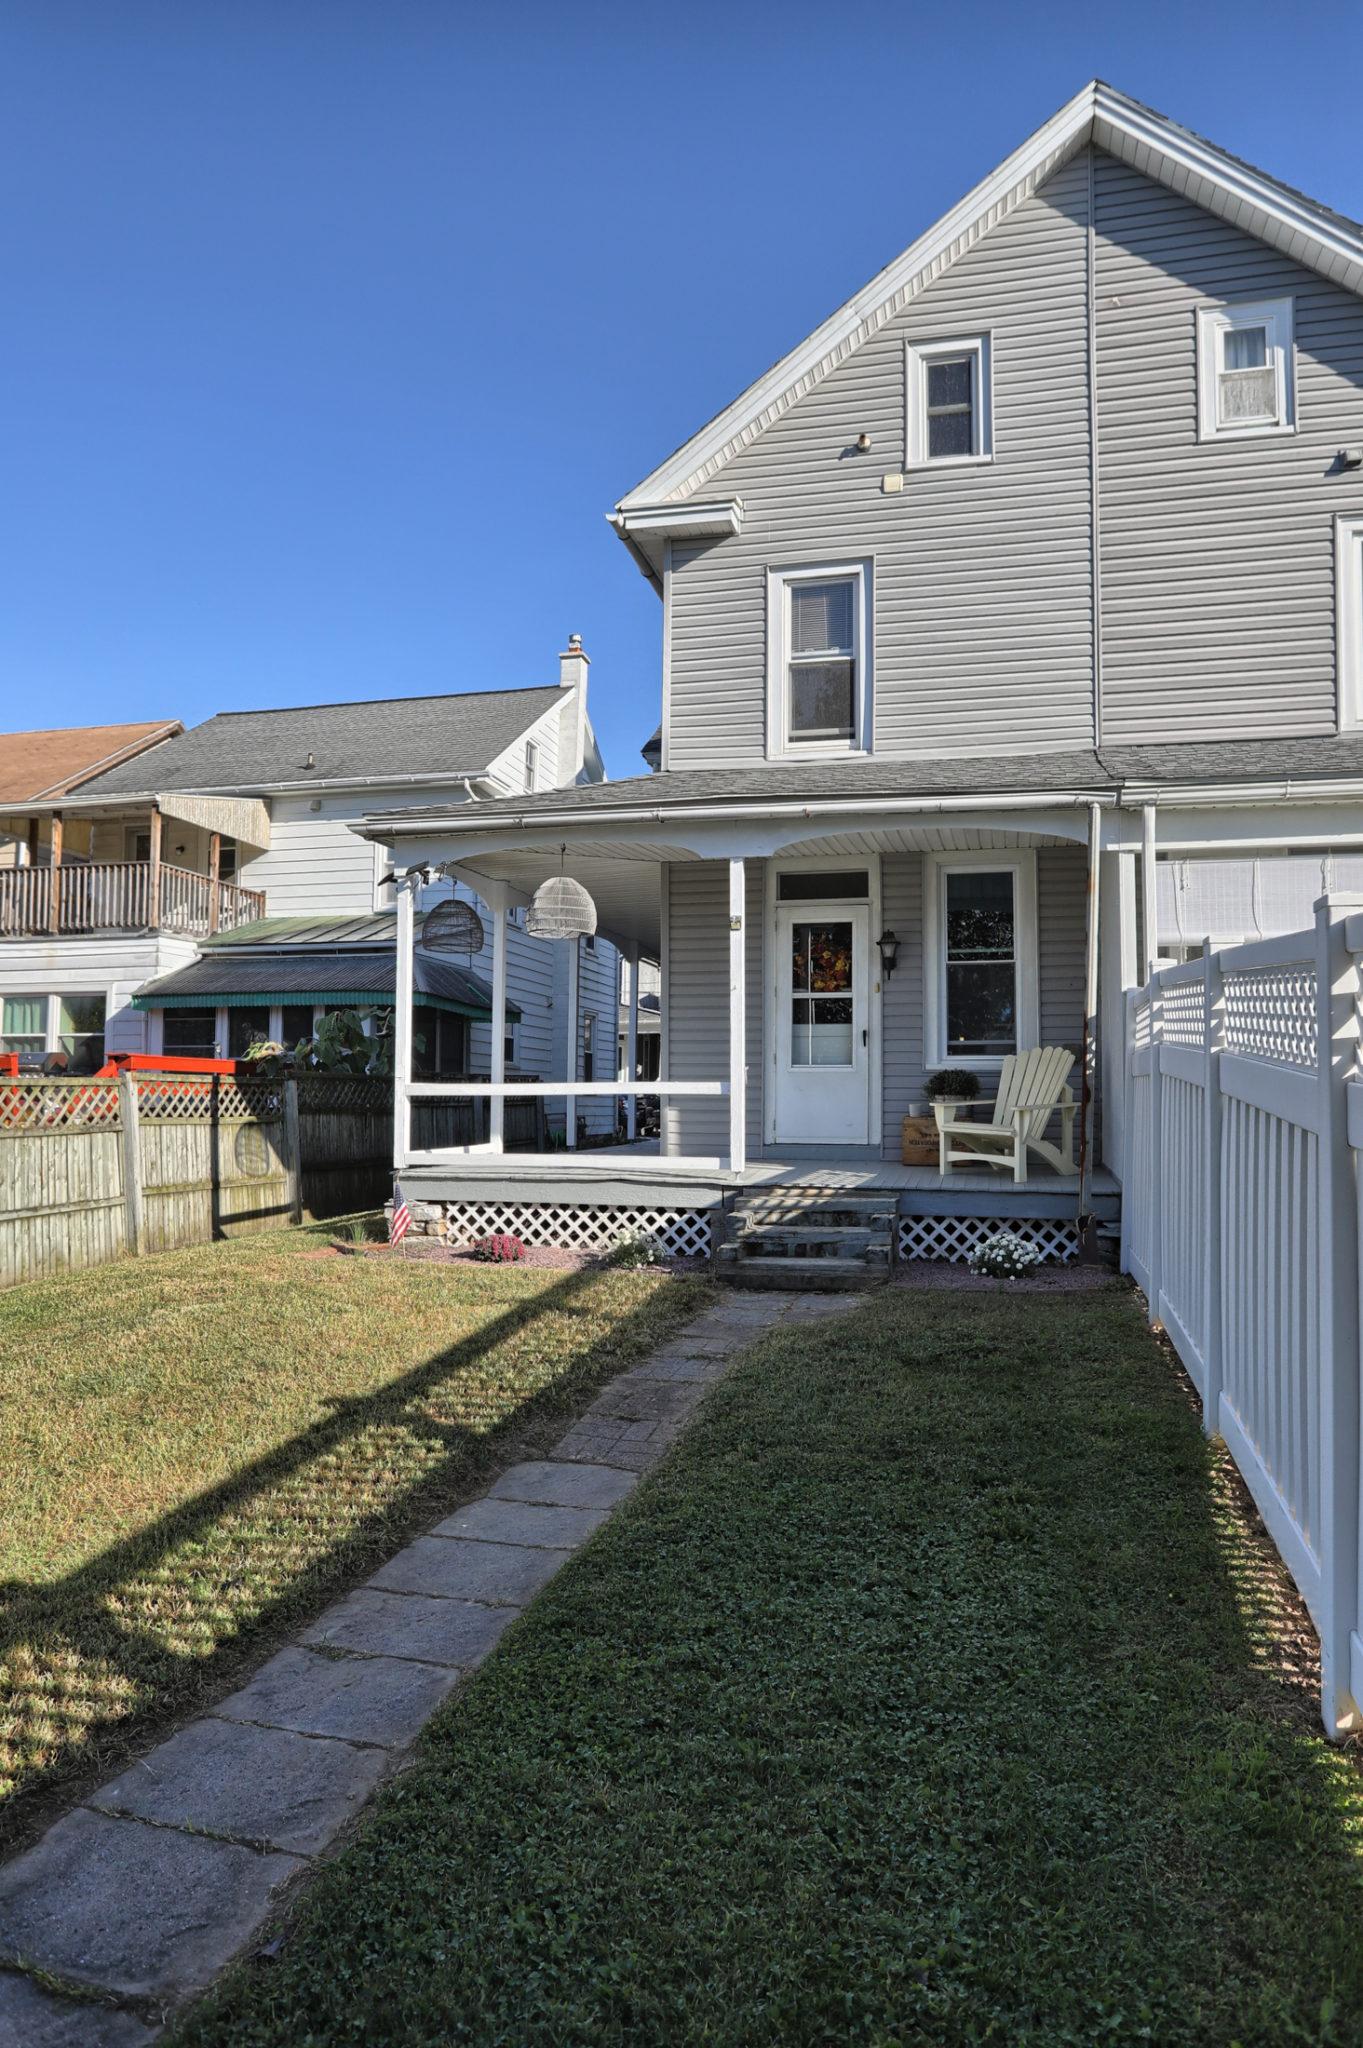 12 E. Maple Avenue - Back of home 2